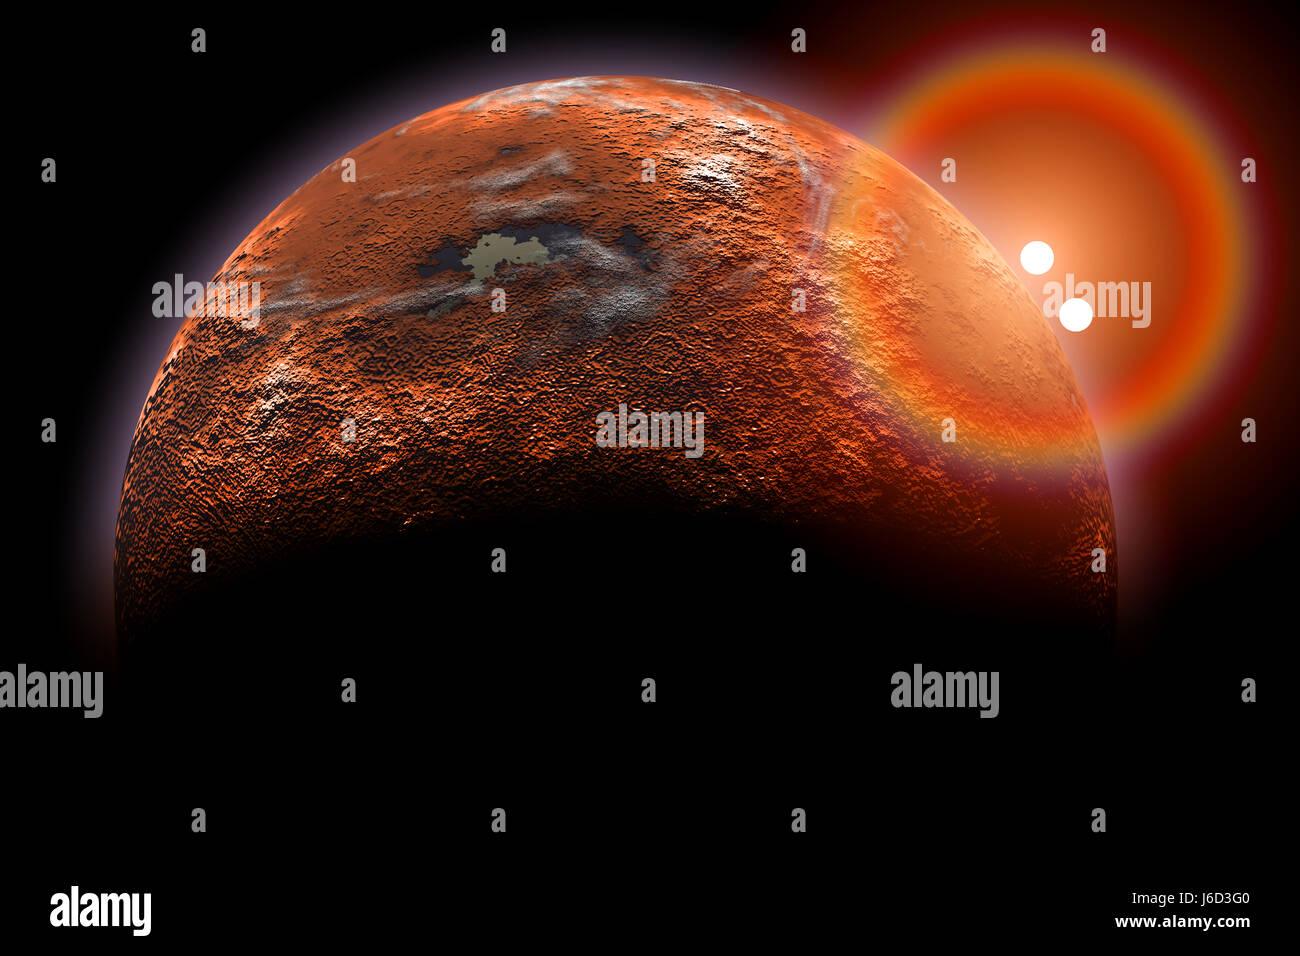 Proxima Centauri B-Exoplanet Stock Photo, Royalty Free ...